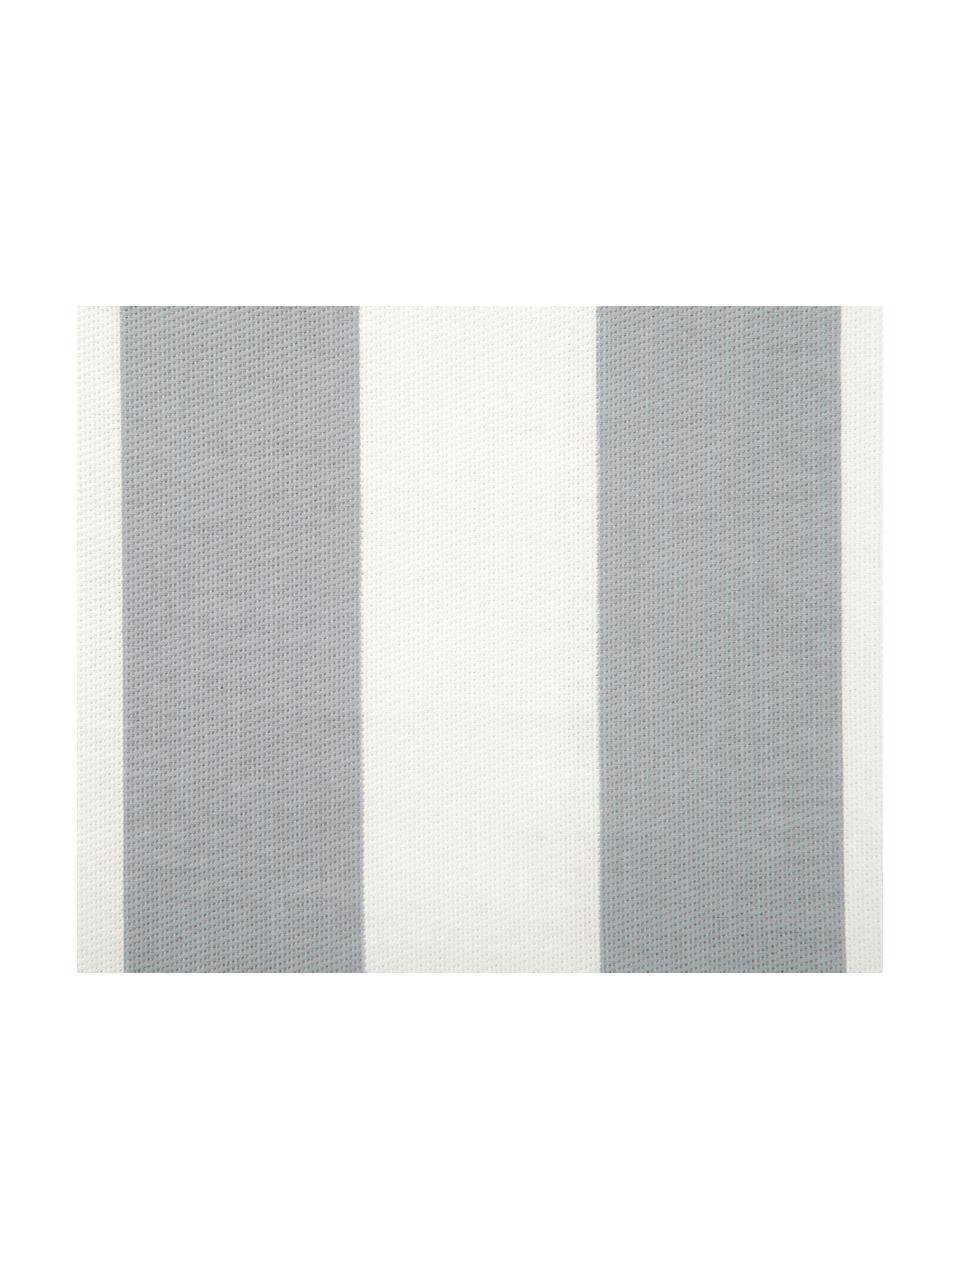 Gestreifte Kissenhülle Timon in Grau/Weiß, 100% Baumwolle, Hellgrau, Weiß, 30 x 50 cm